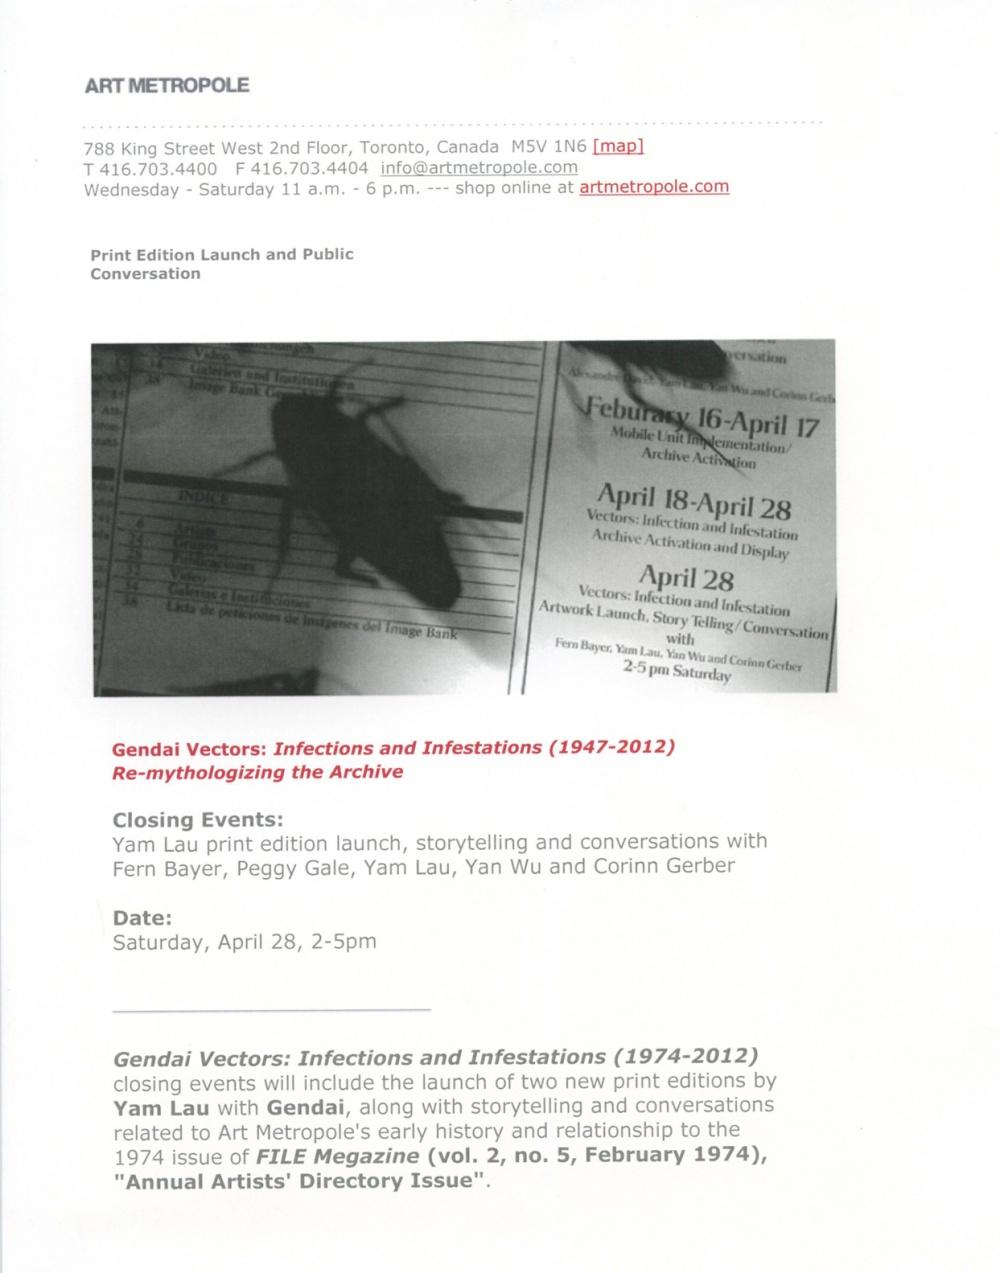 AMA1212.1, page 1